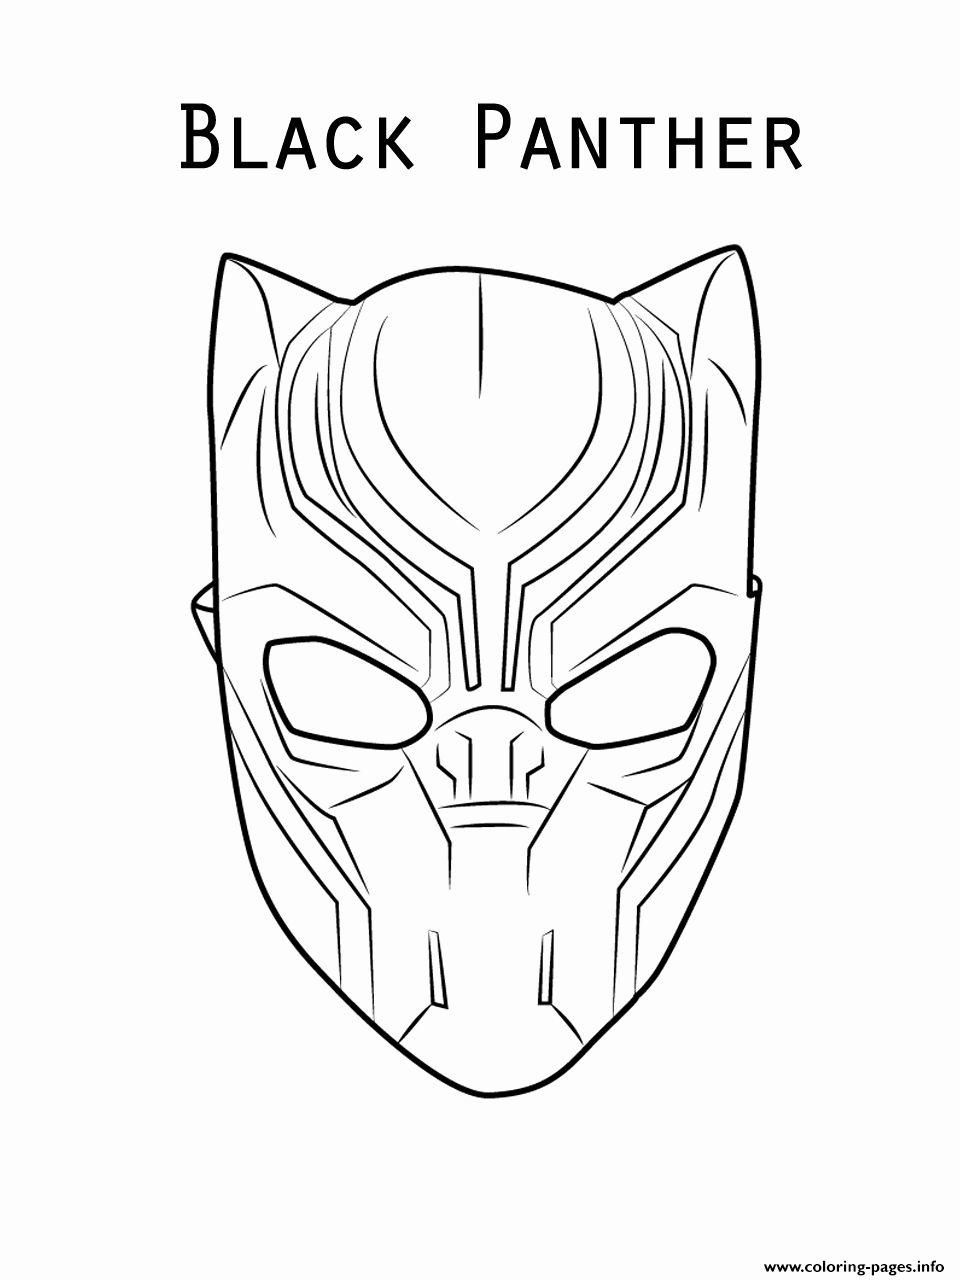 Black Panther Coloring Page Unique Print Marvel Movie